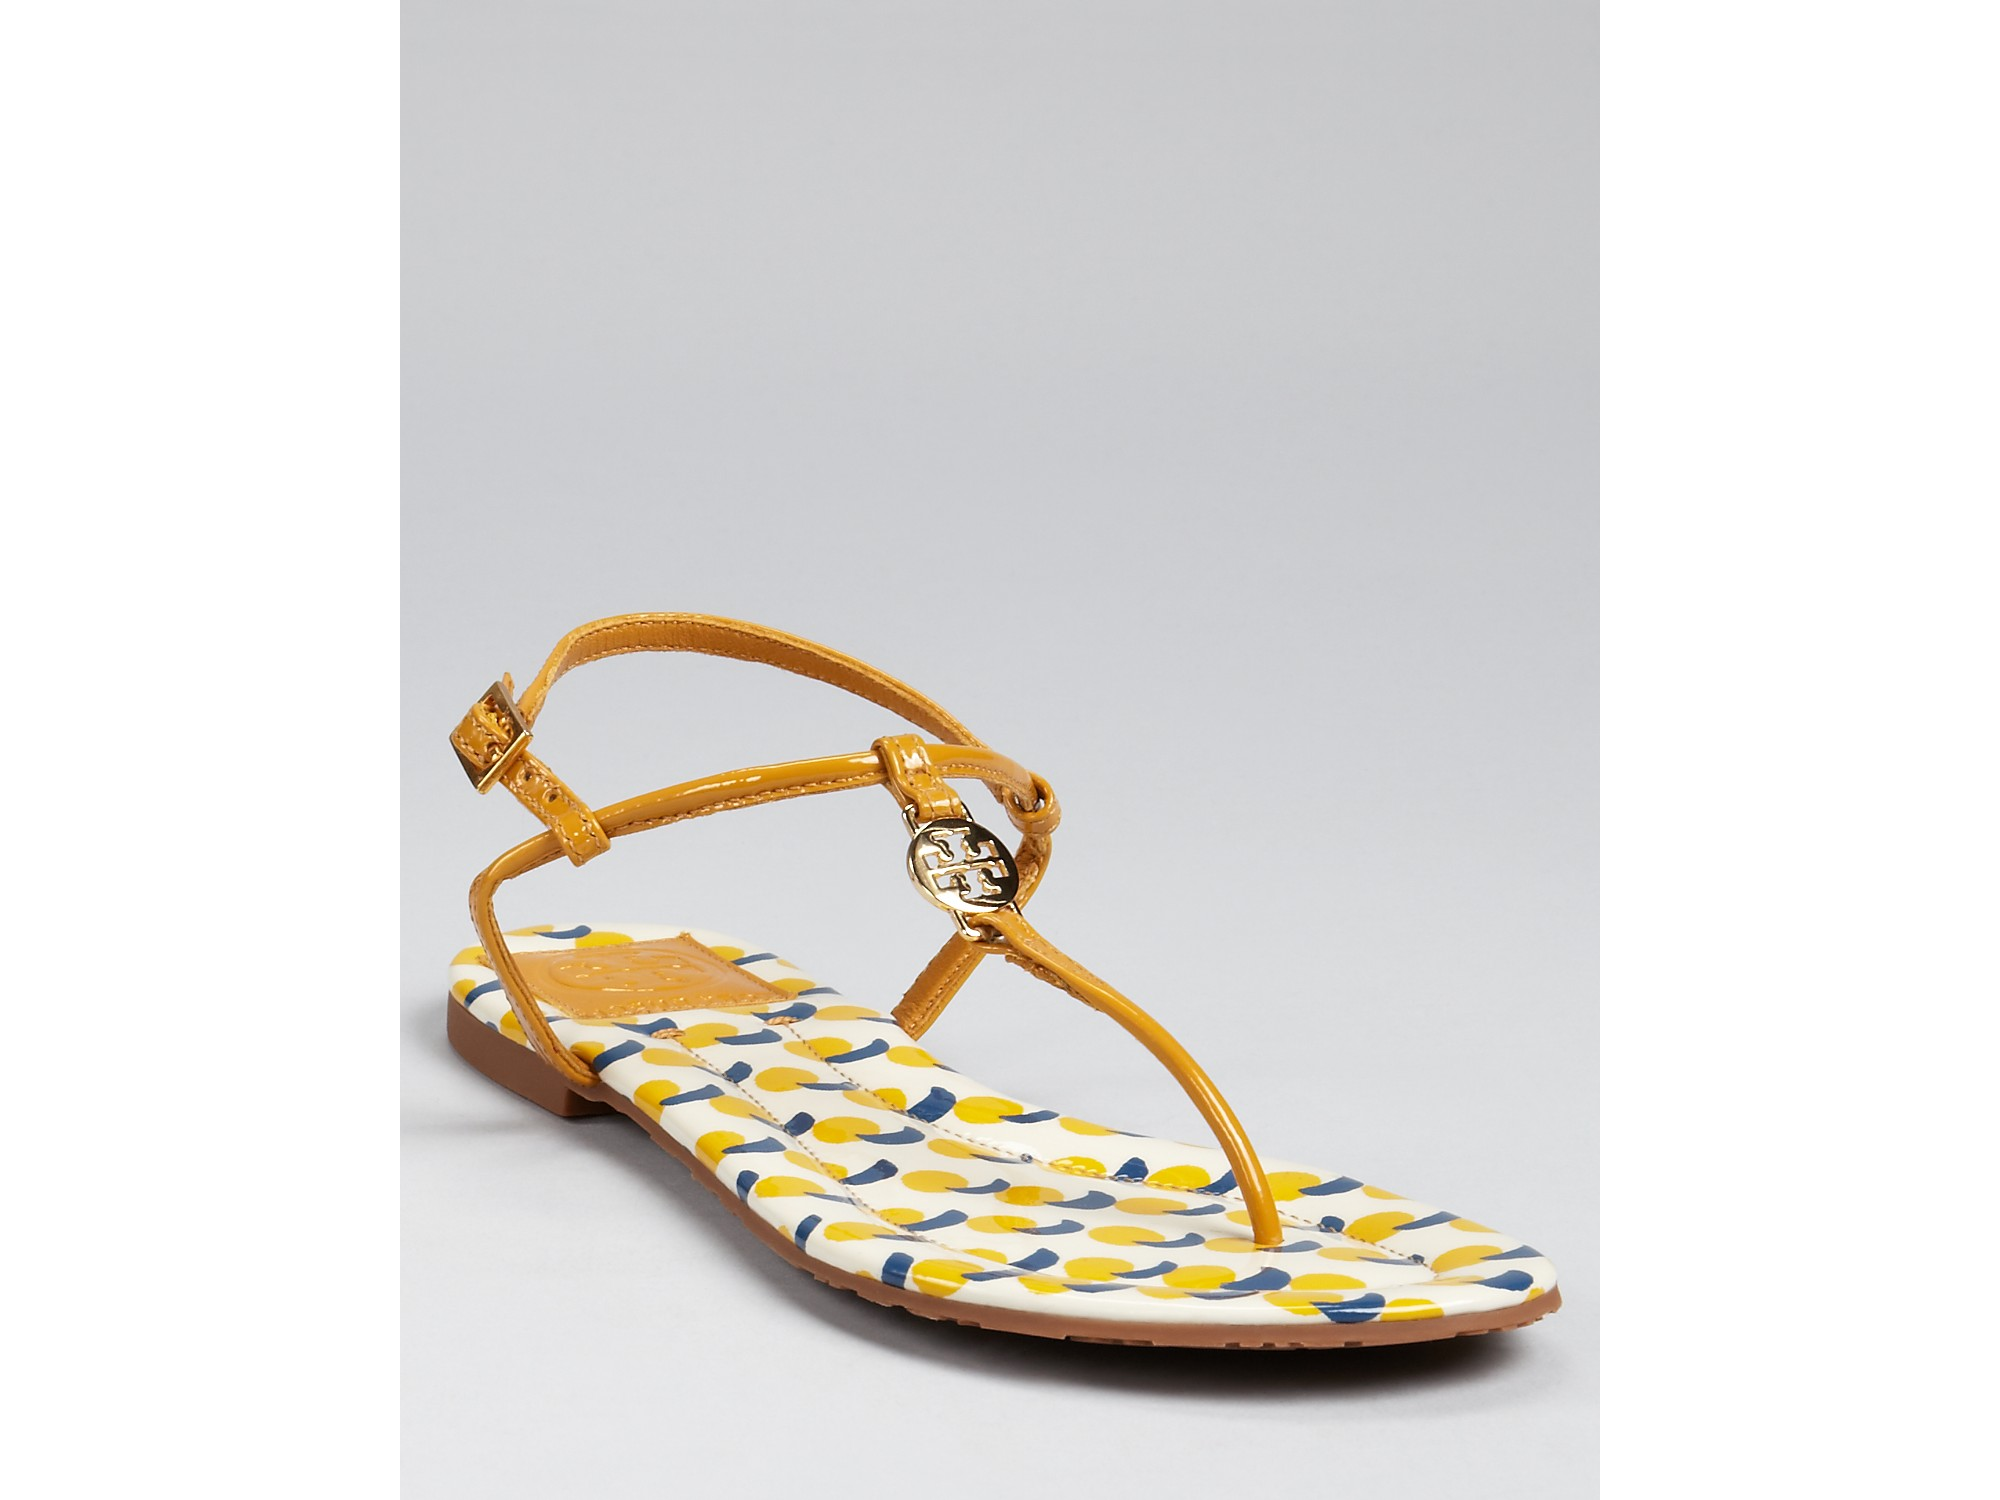 390008af7 Lyst - Tory Burch Sandals Emmy Flat in Yellow